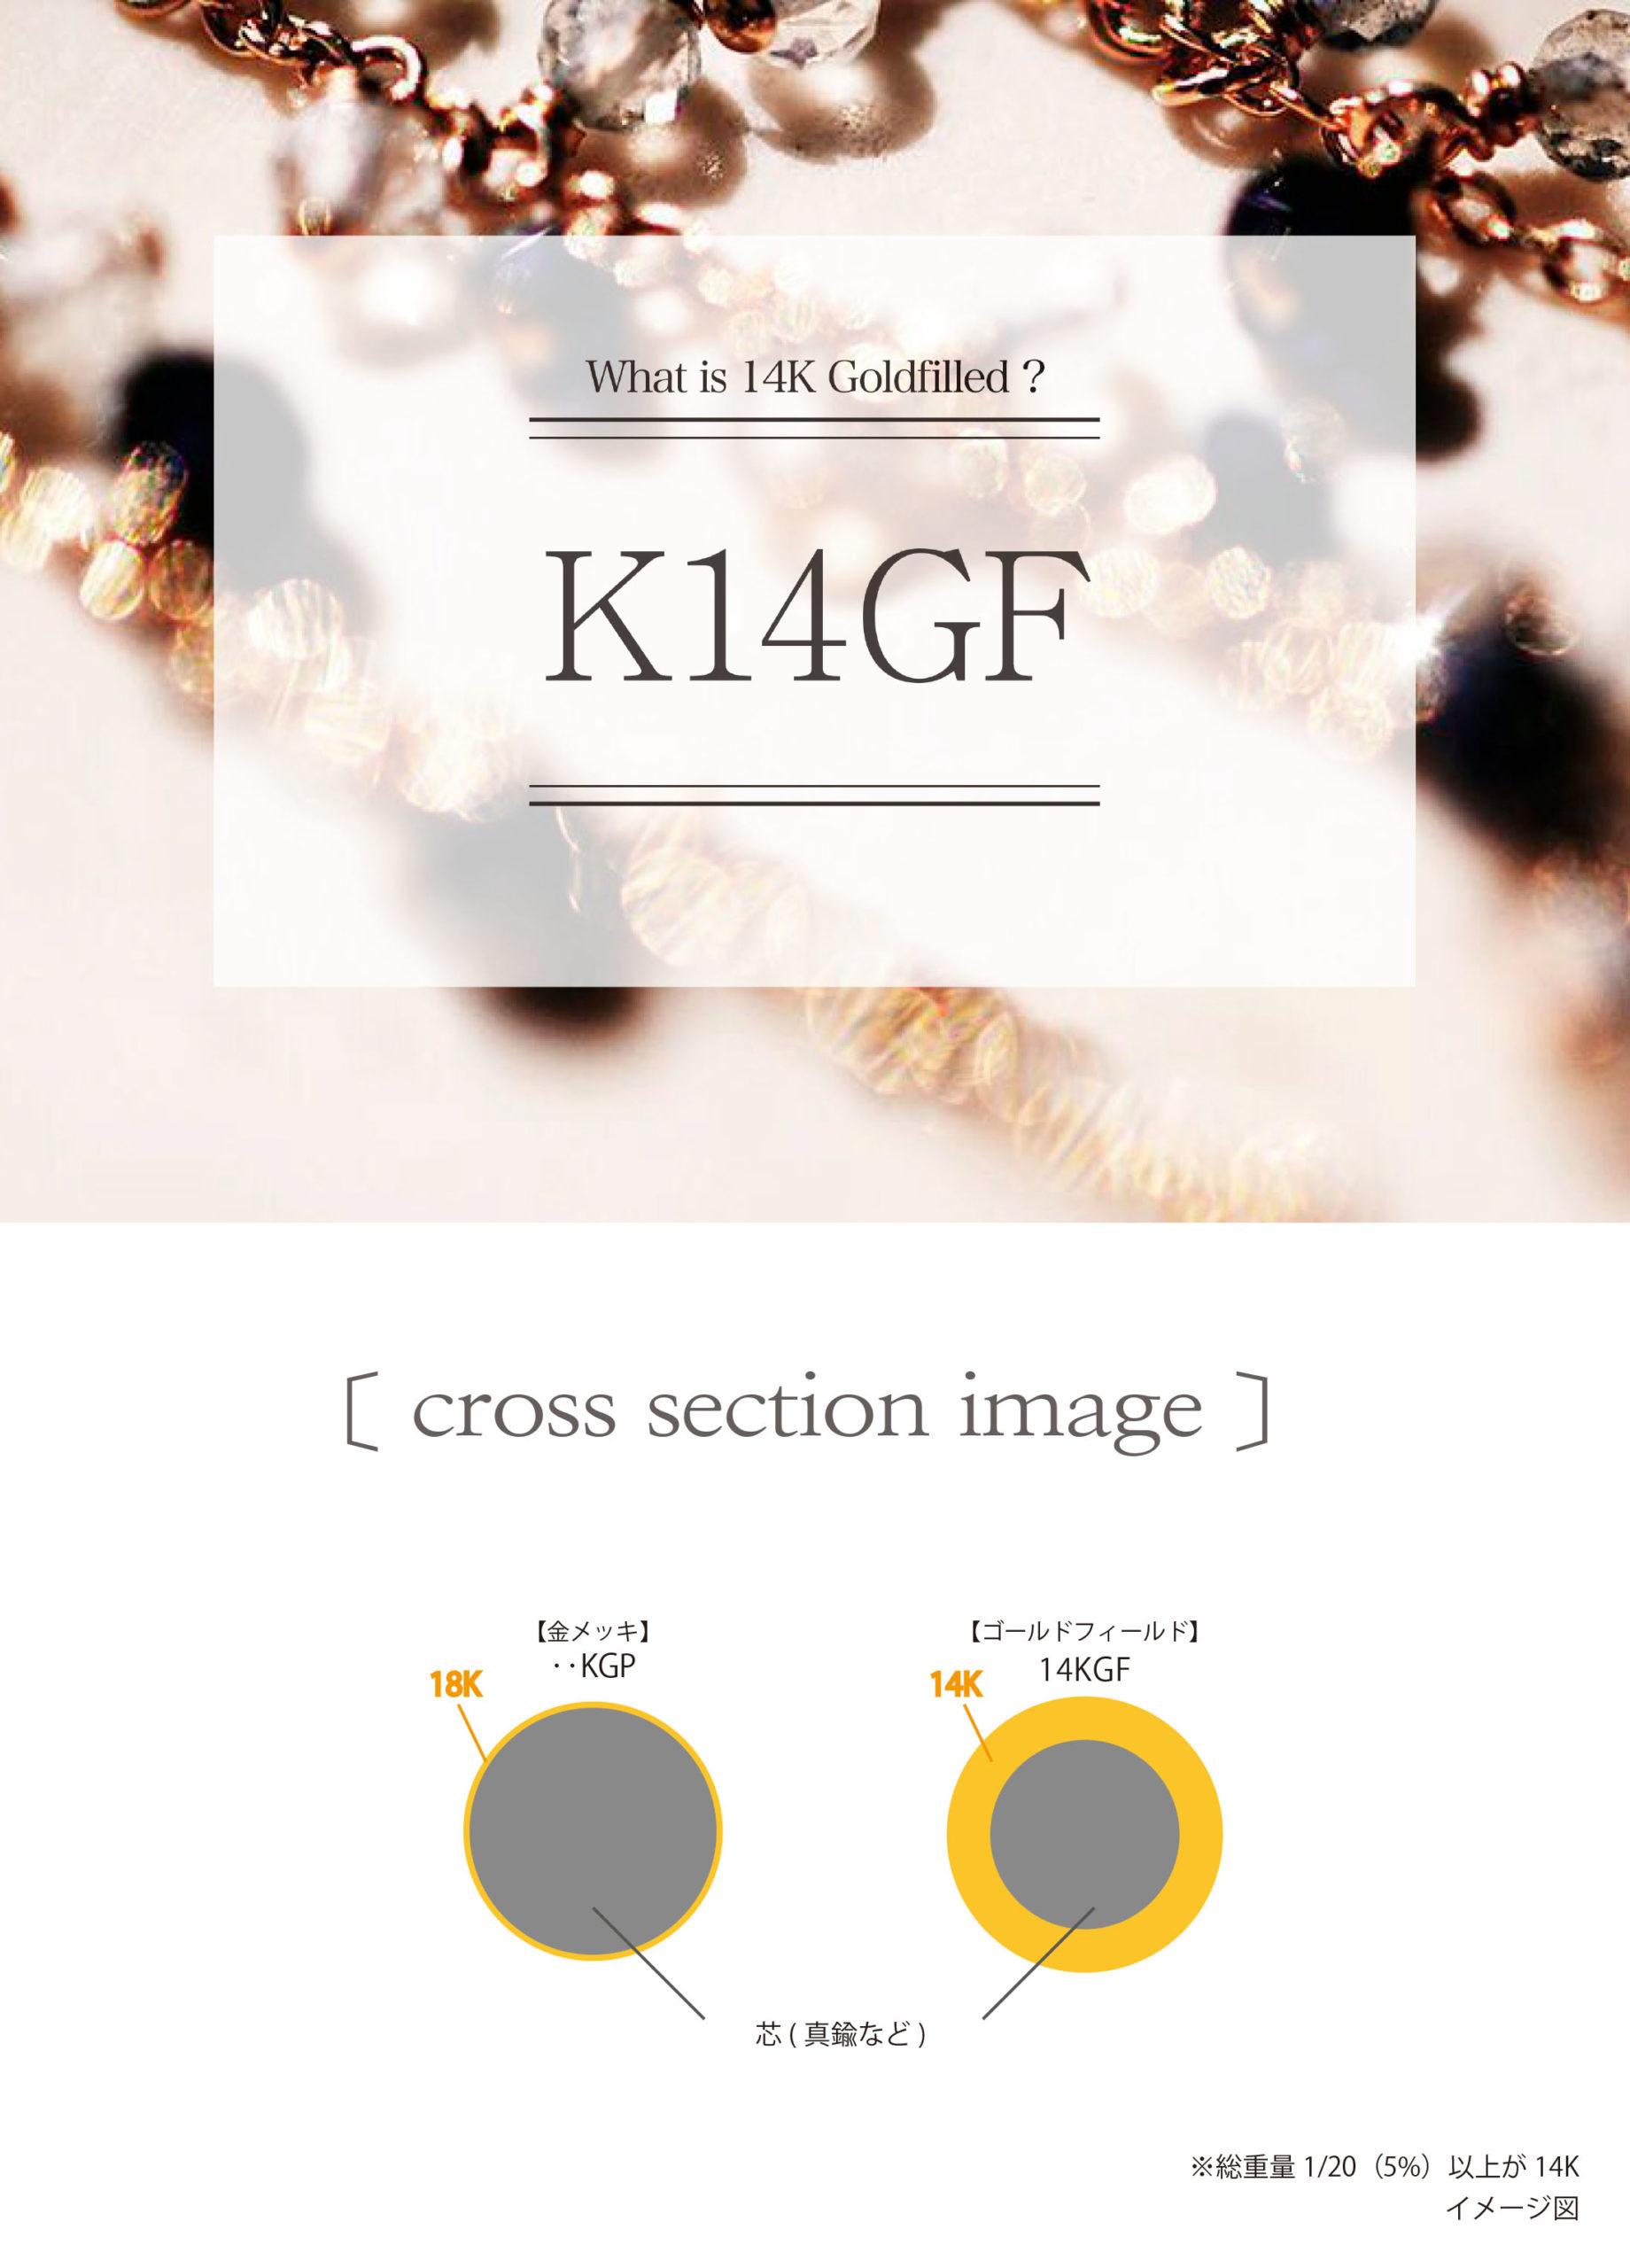 K14GF